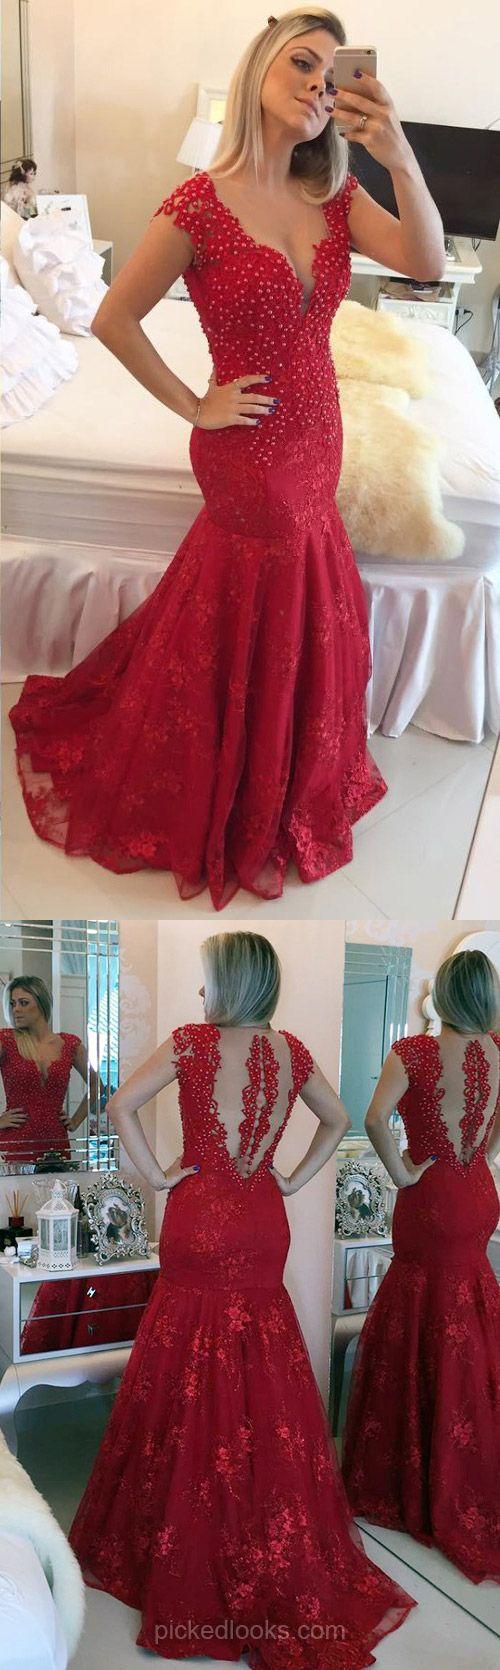 Mermaid ball dresses burgundy long prom dresses lace v neck